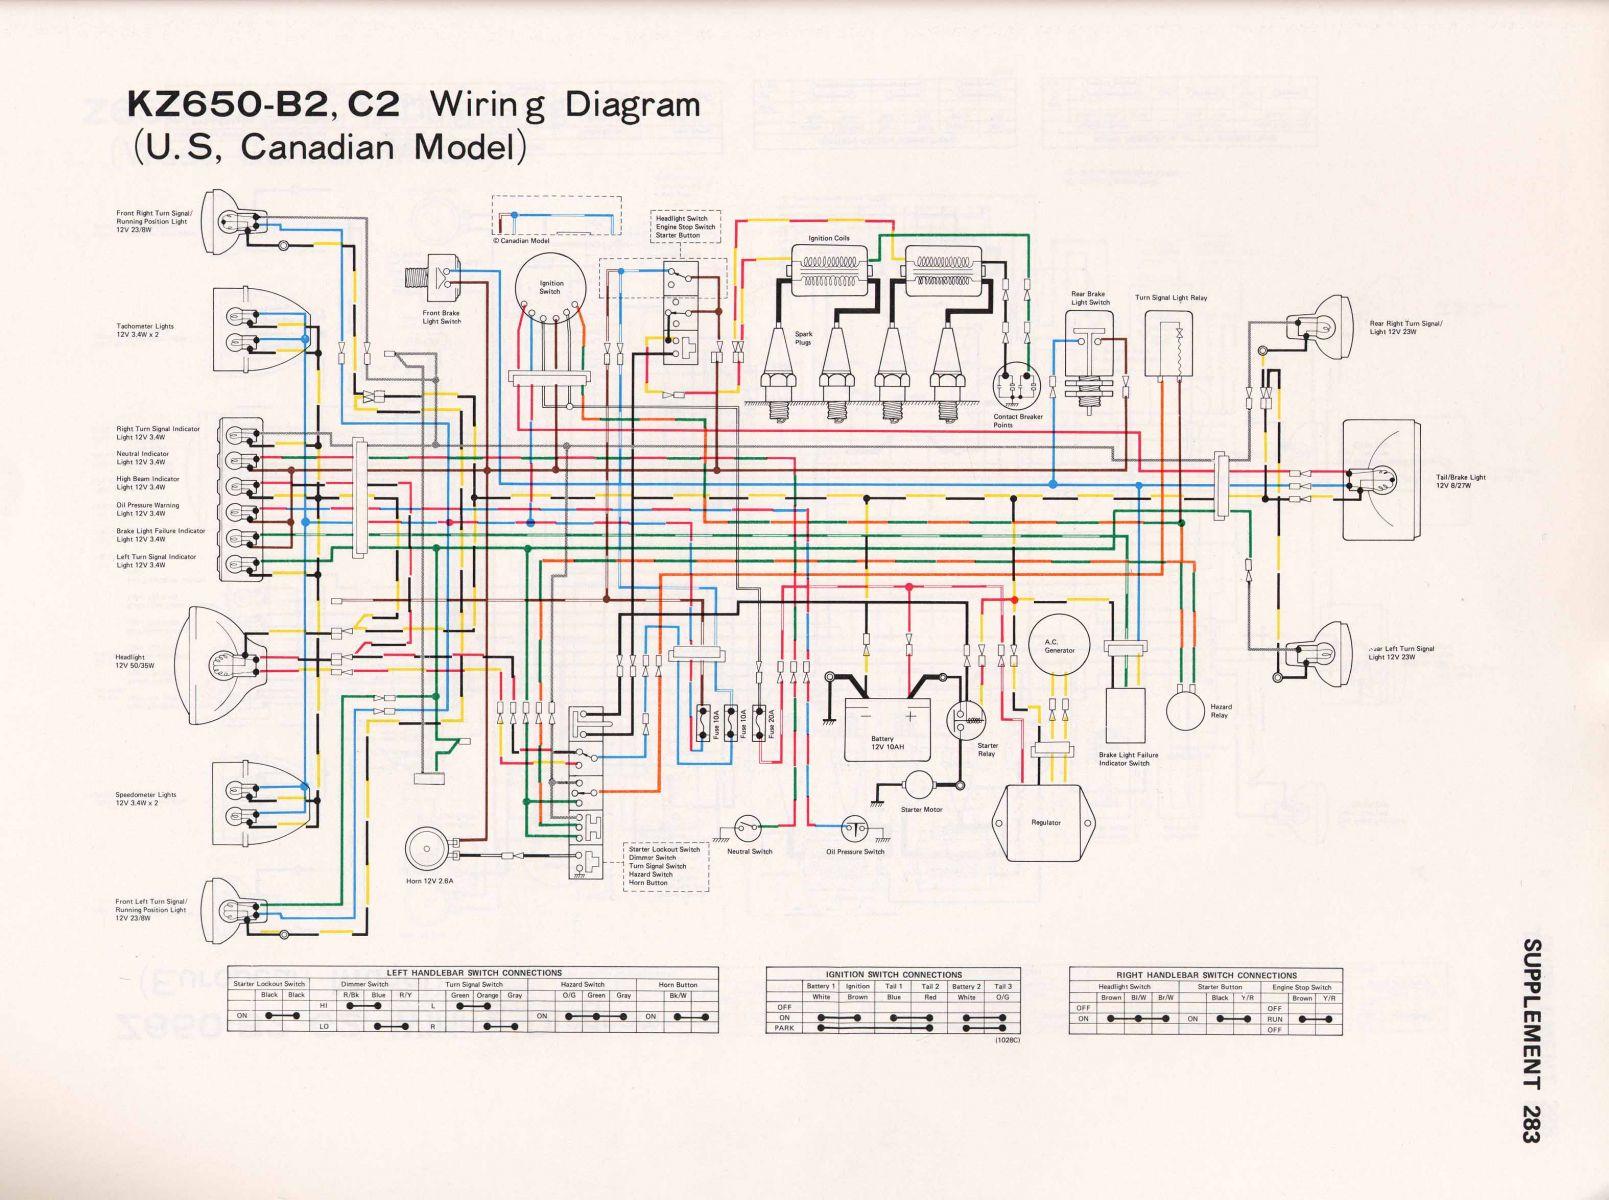 hight resolution of gpz 1100 wiring diagram wiring diagram technic gpz 1100 wiring diagram